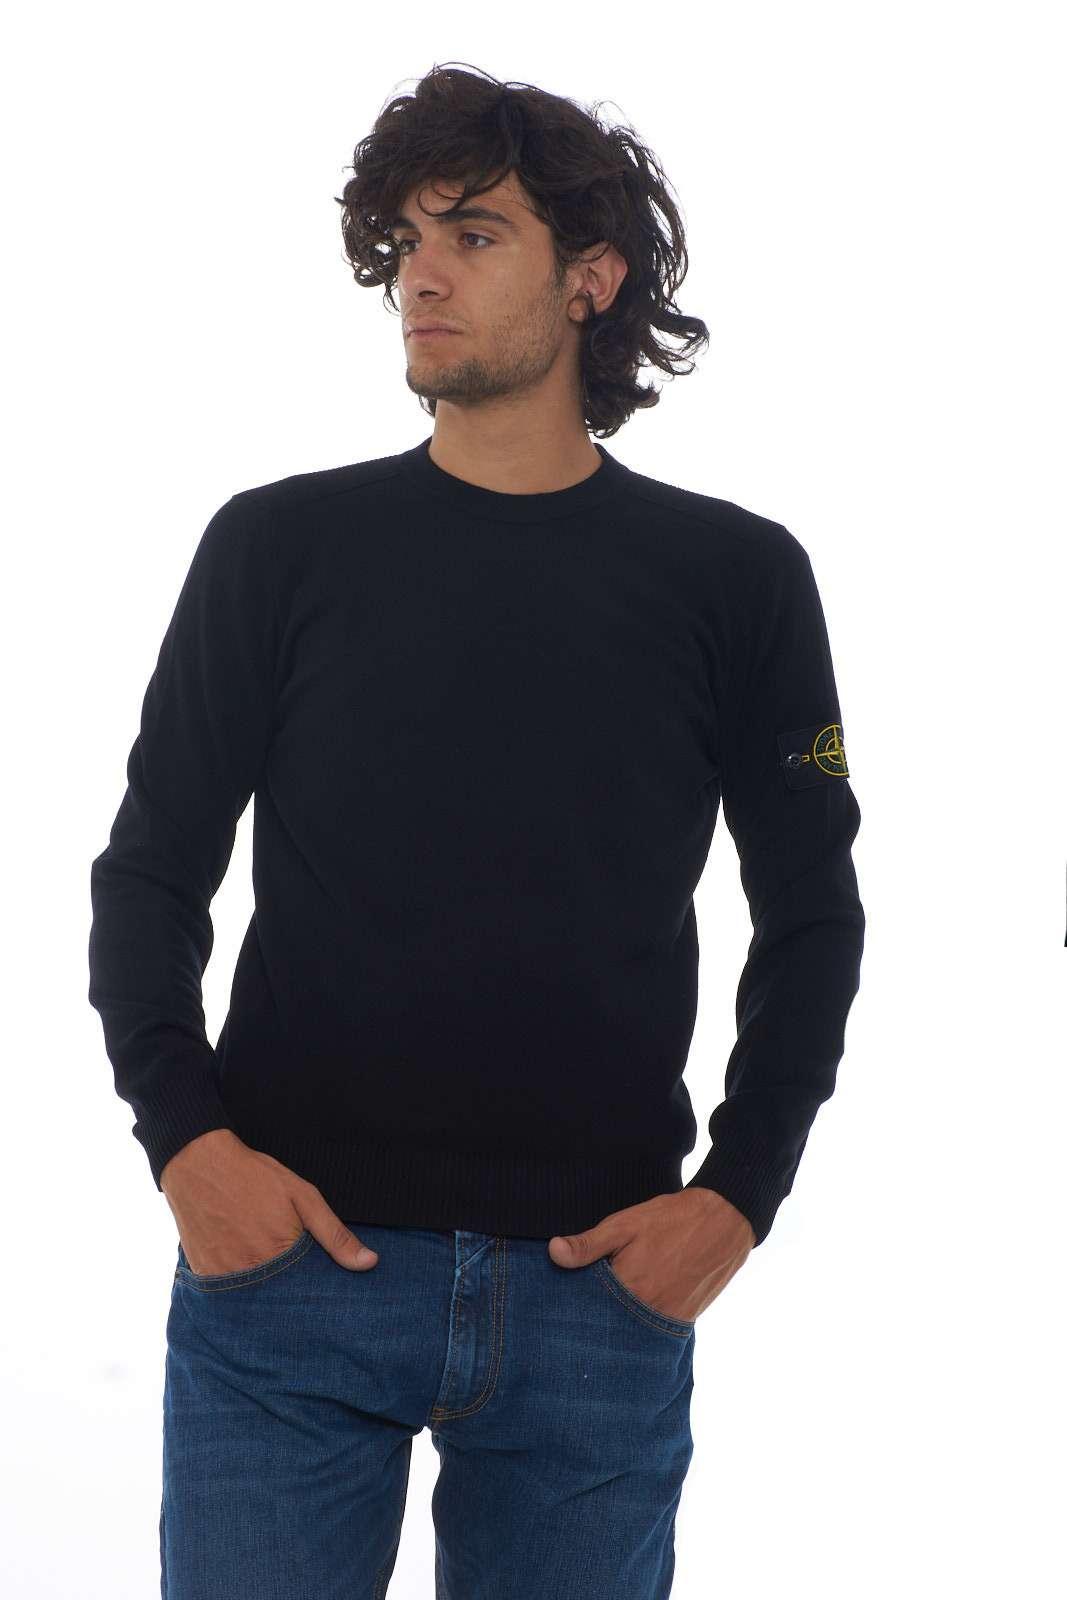 https://www.parmax.com/media/catalog/product/a/i/AI-outlet_parmax-maglia-uomo-Stone-Island-7115591A1-A_1.jpg